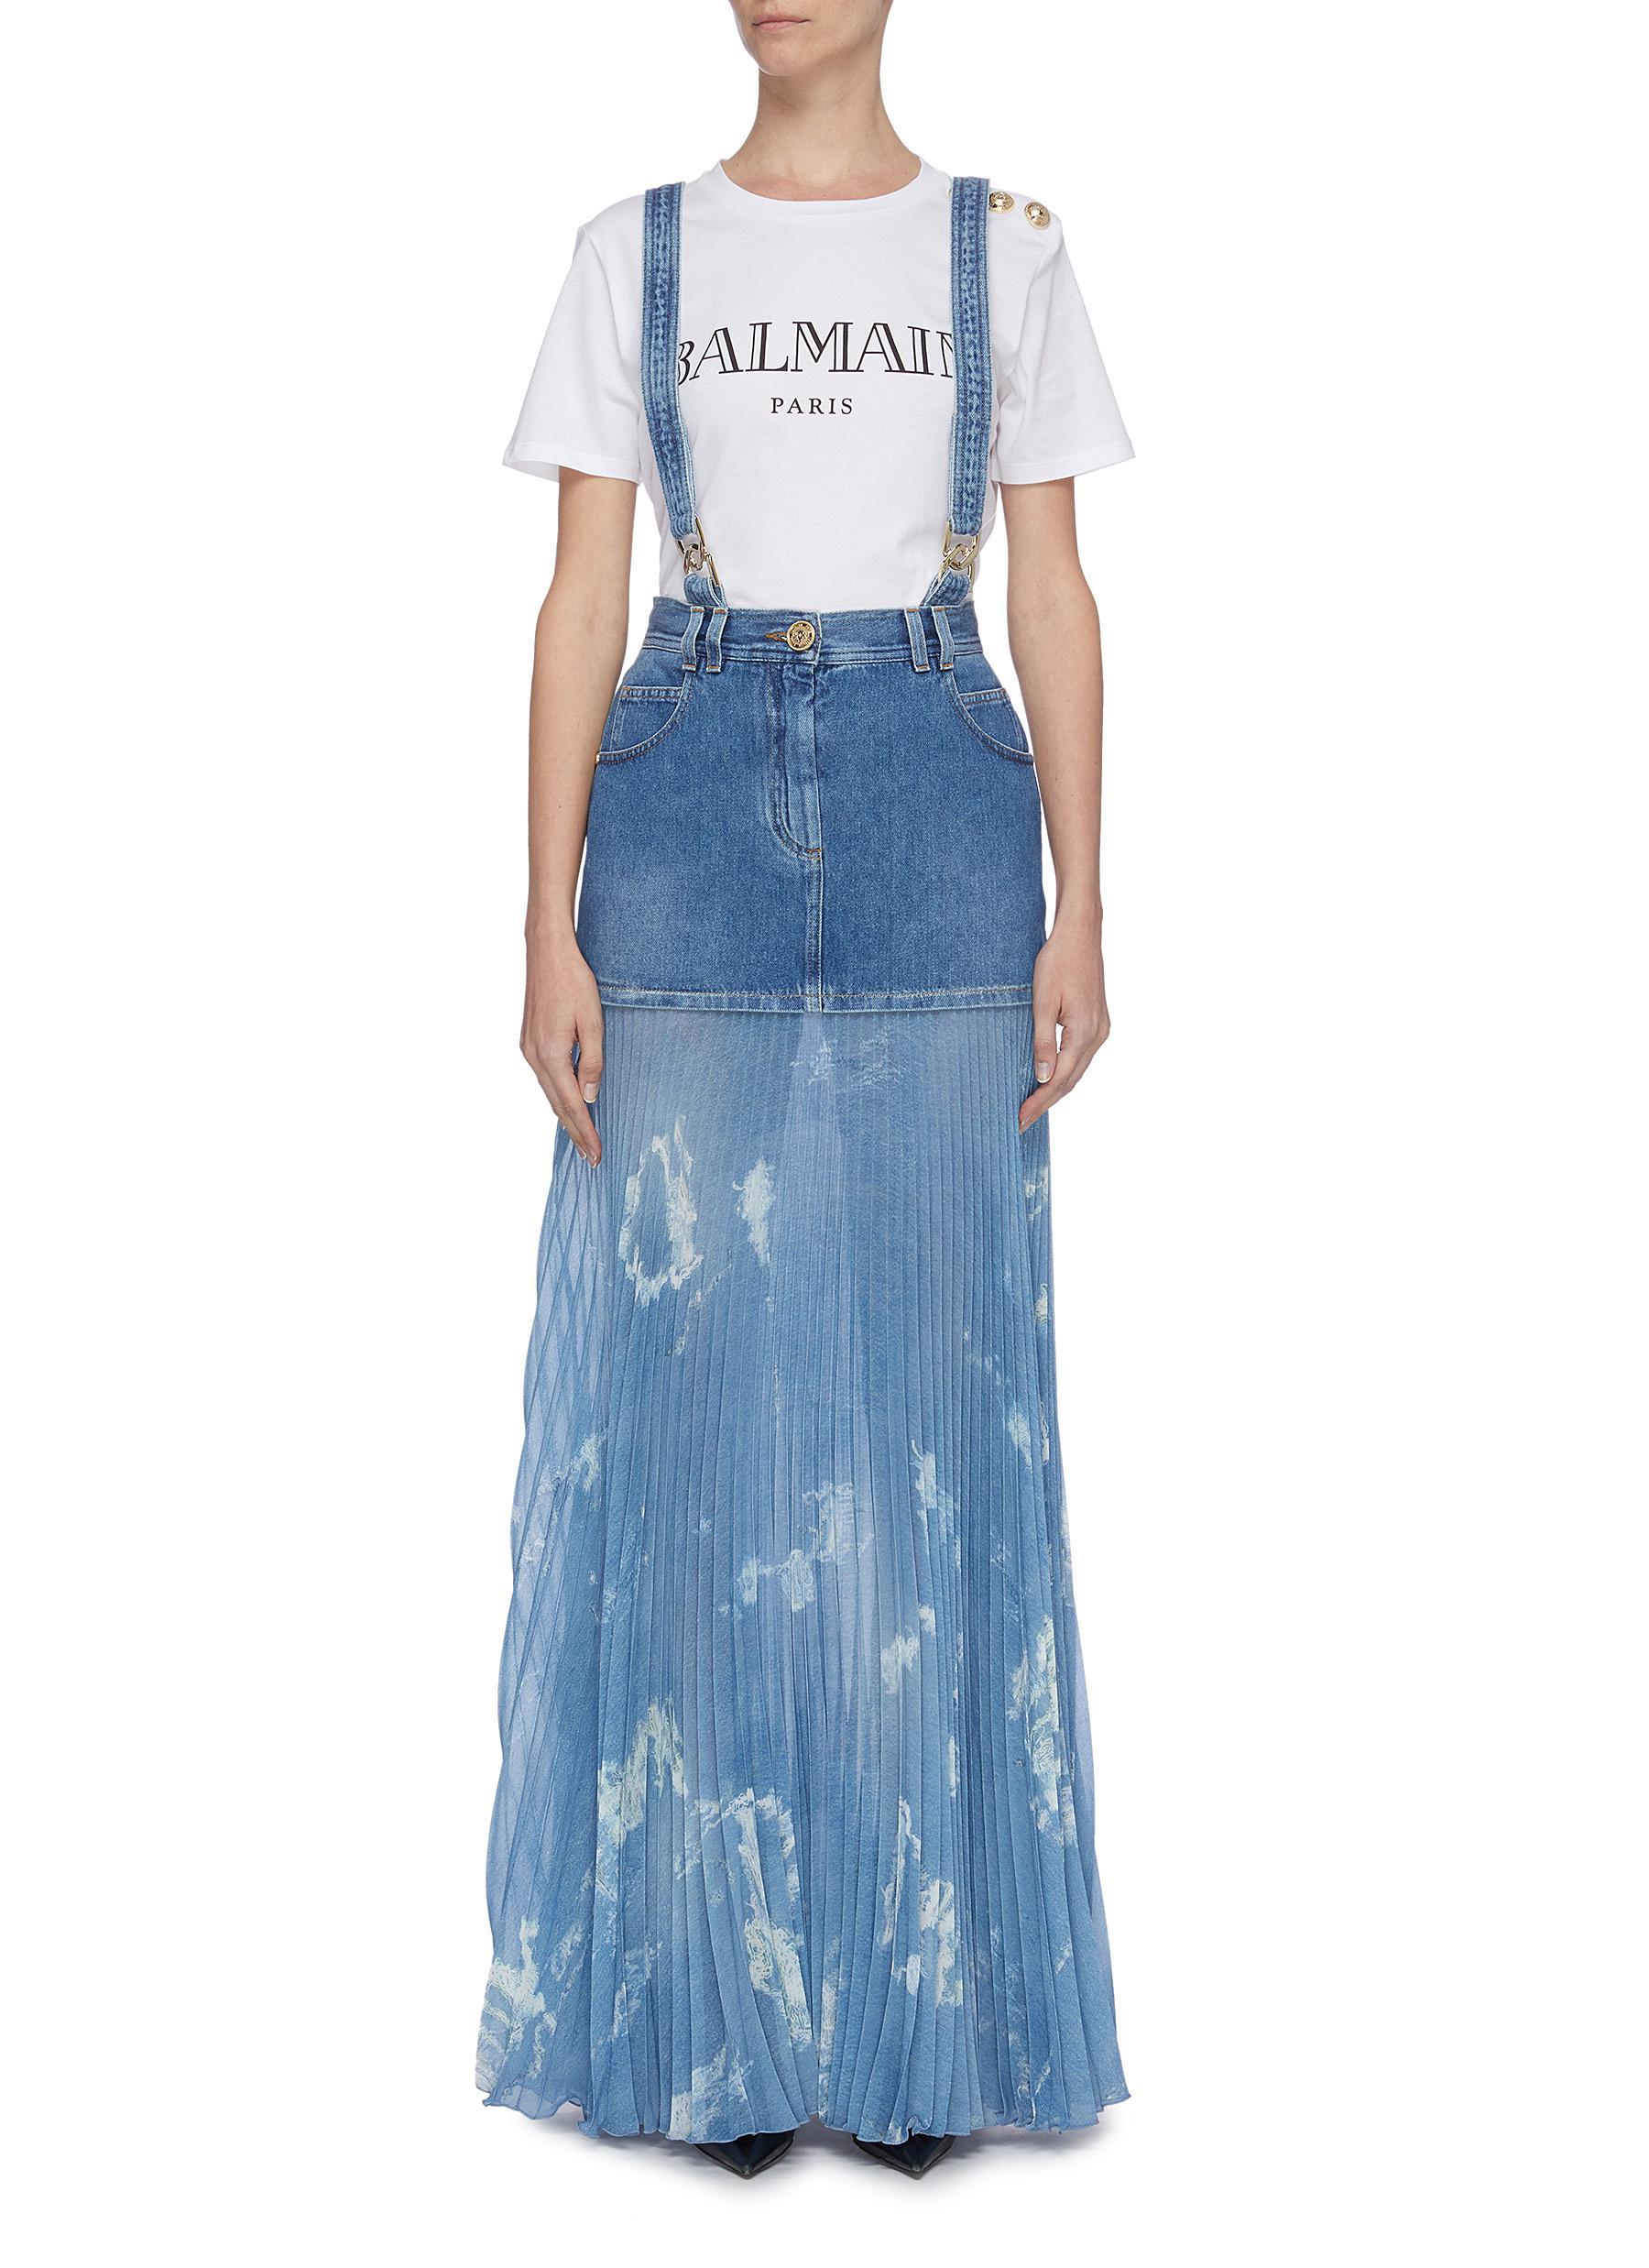 Buy Balmain Skirts Panelled distressed pleated suspender denim skirt